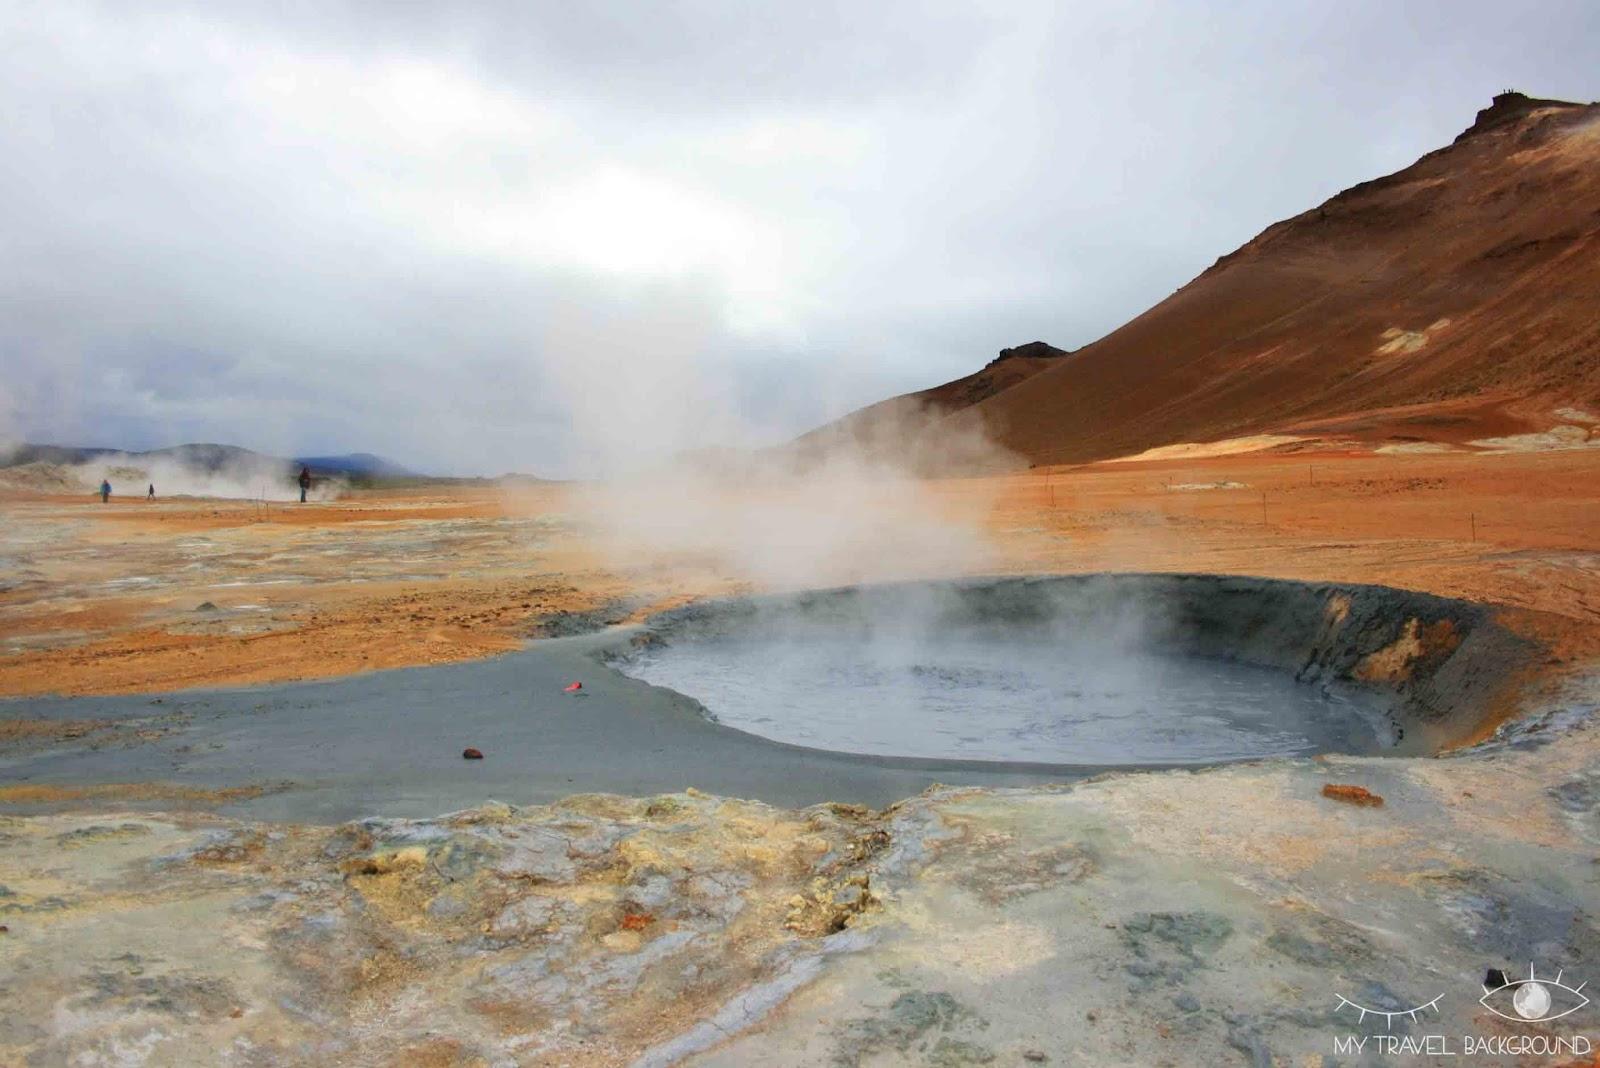 My Travel Background : 18 lieux à découvrir absolument en Islande, regarder la Terre respirer